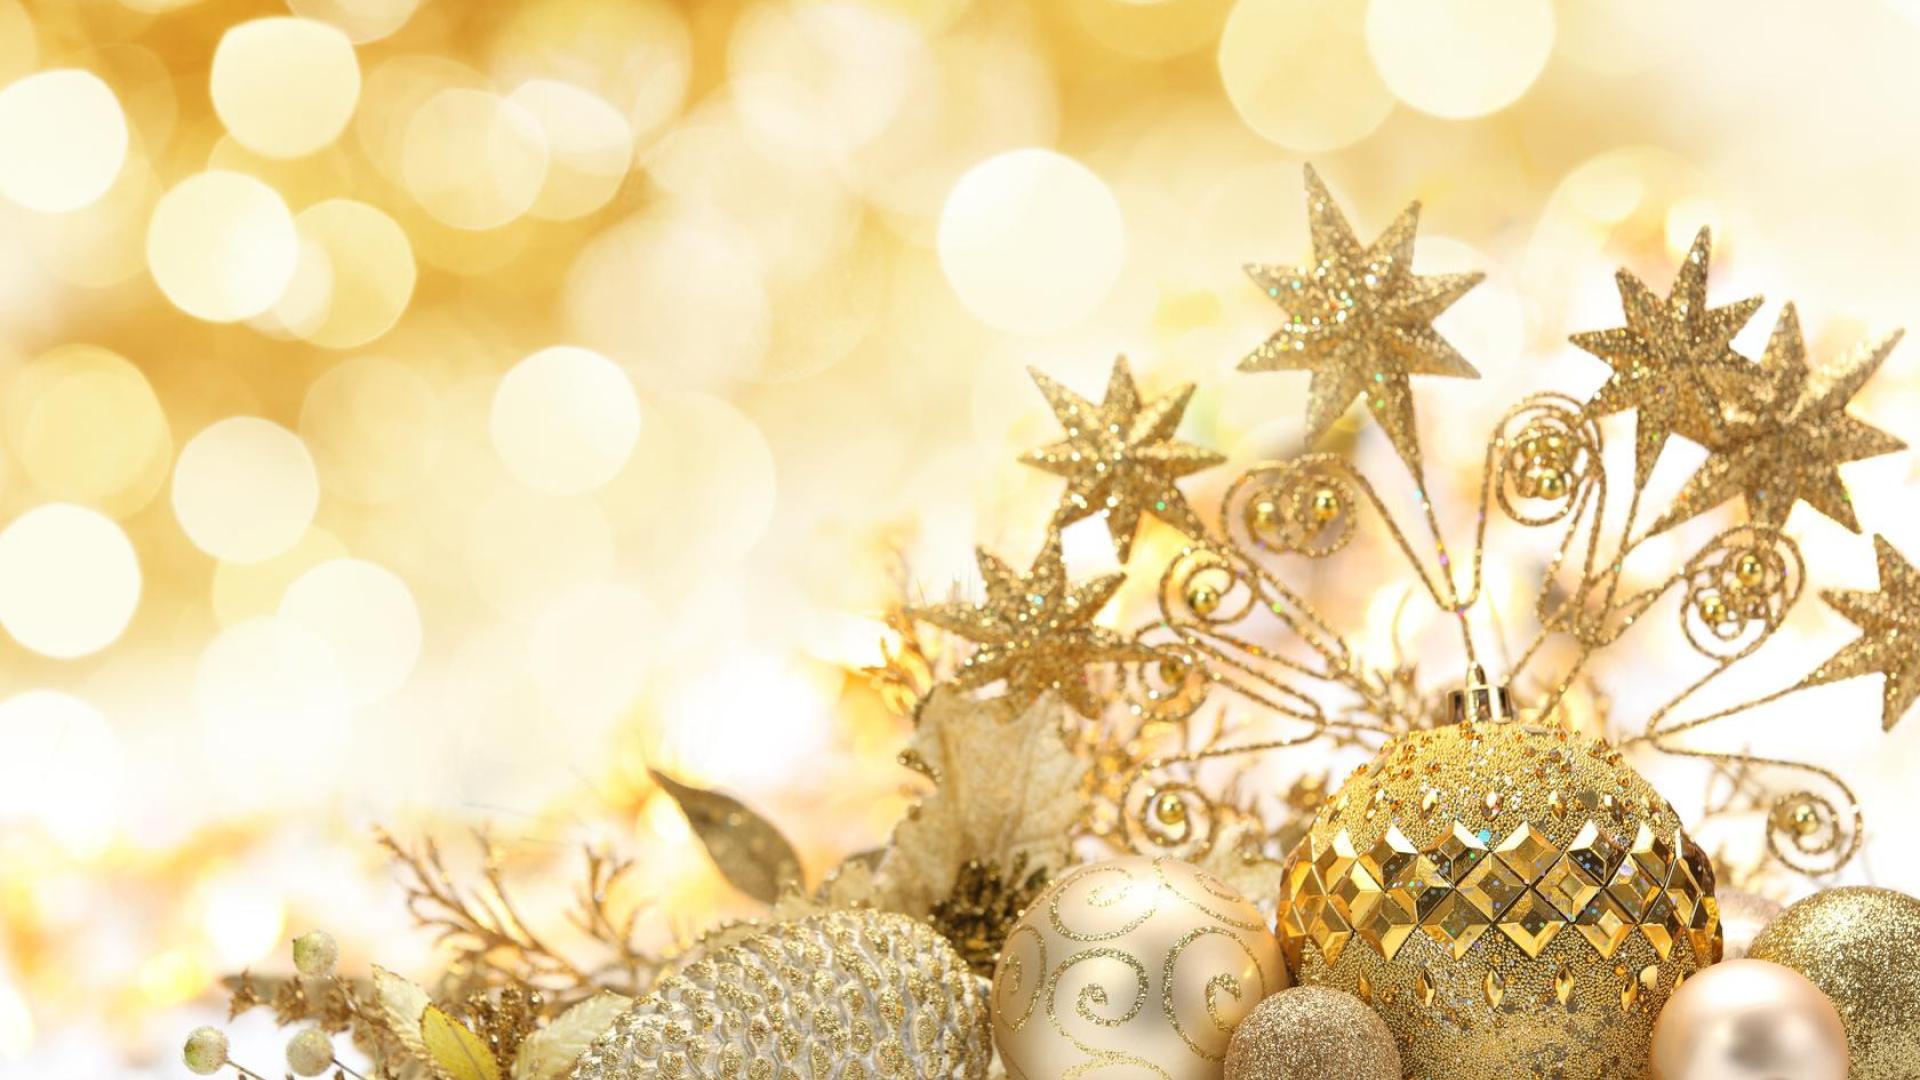 Christmas Wallpapers Decoration Balls